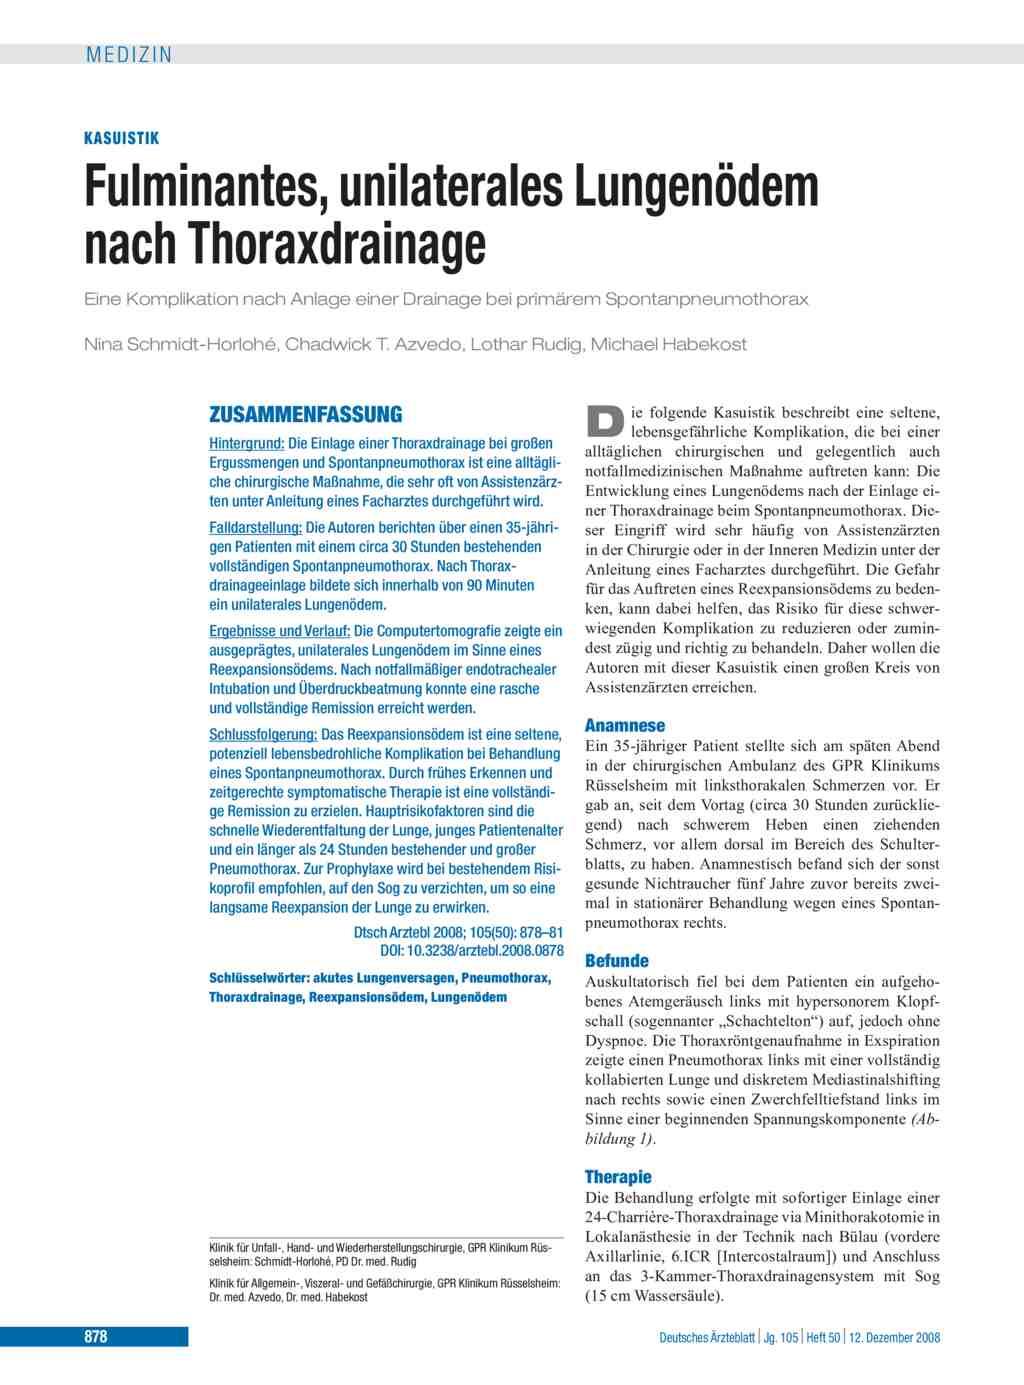 Thoraxdrainage